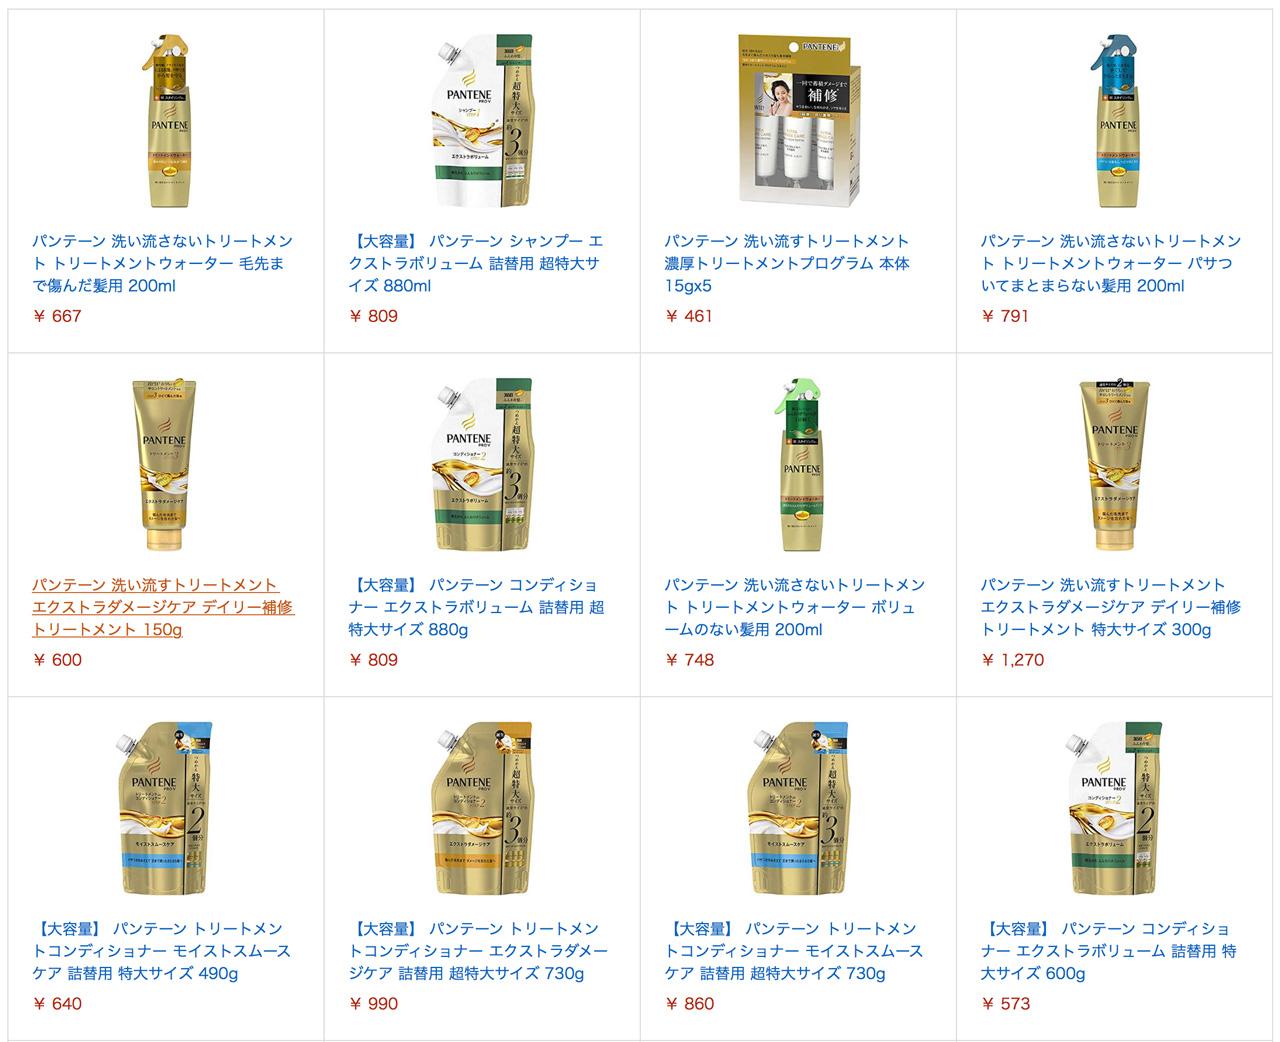 amazon-dash-japan-brands-pantone